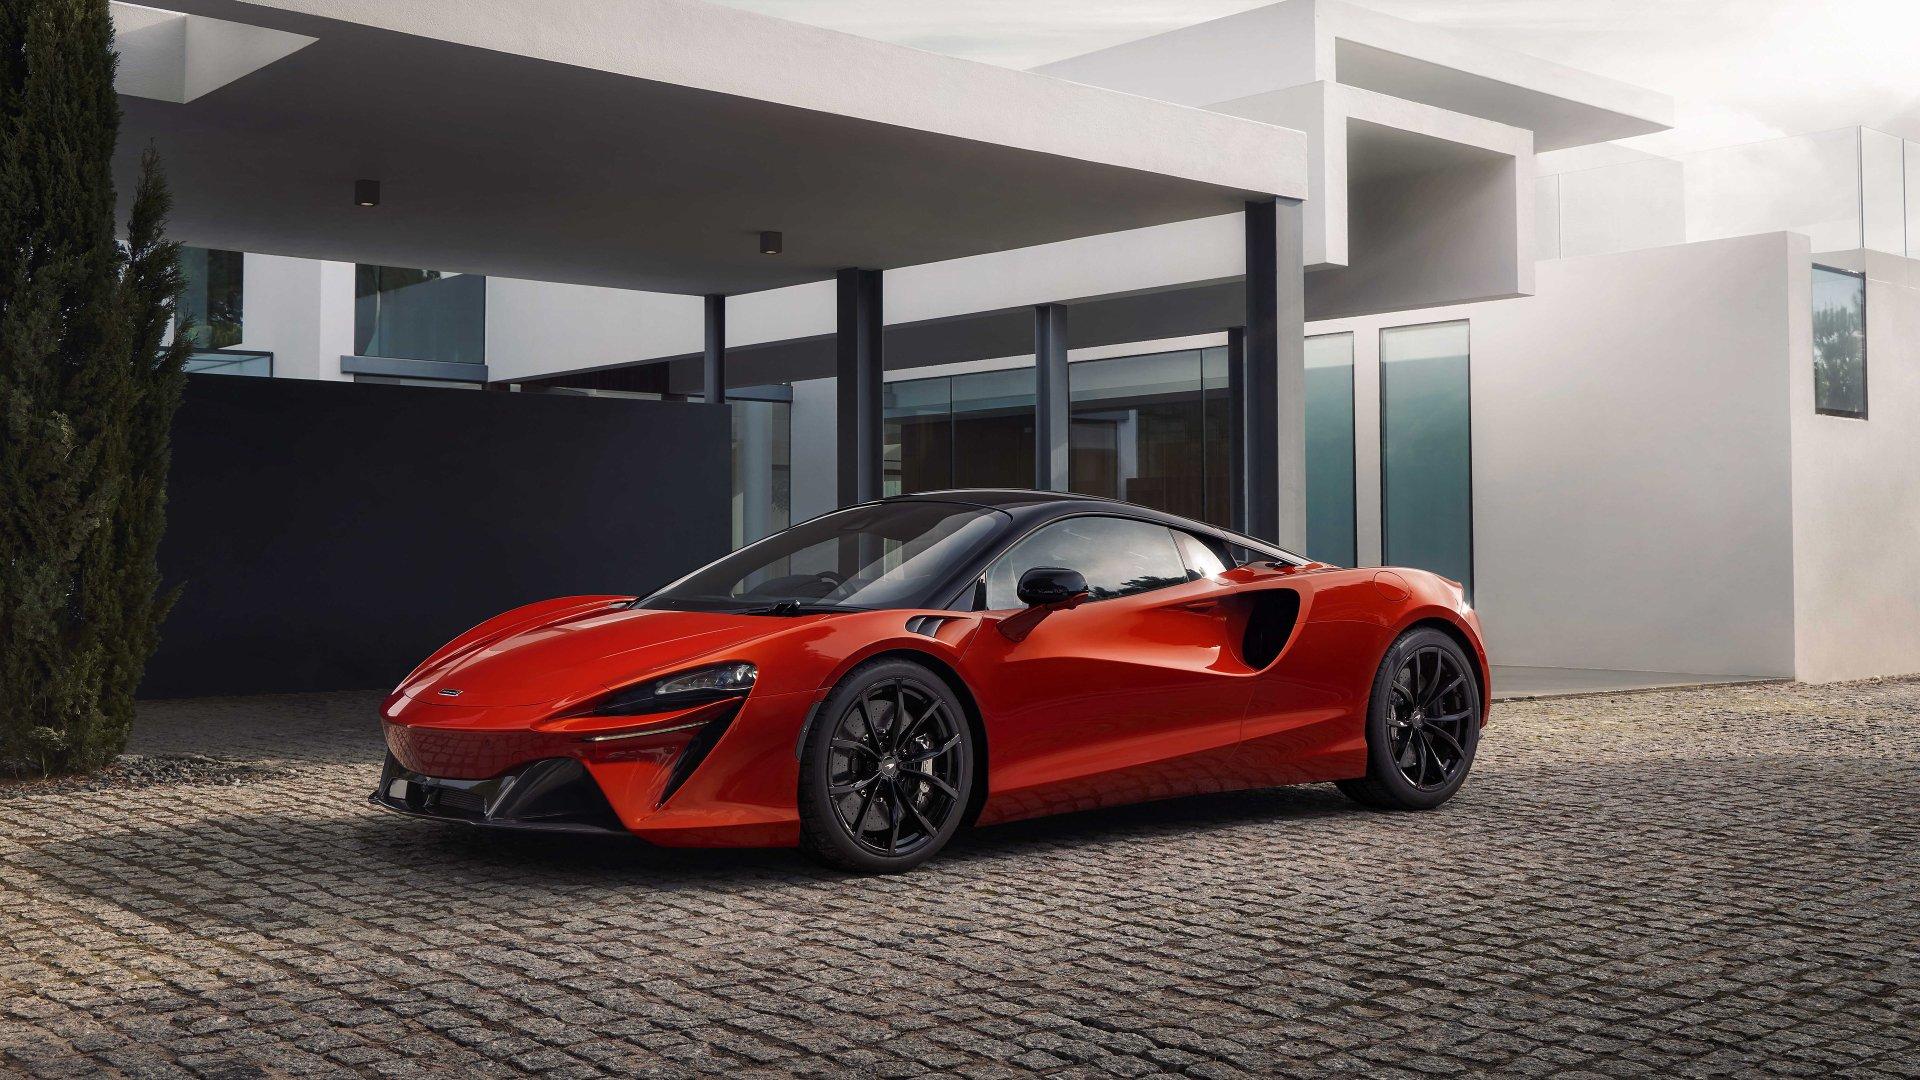 McLaren Artura 15k Ultra HD Wallpaper | Background Image ...